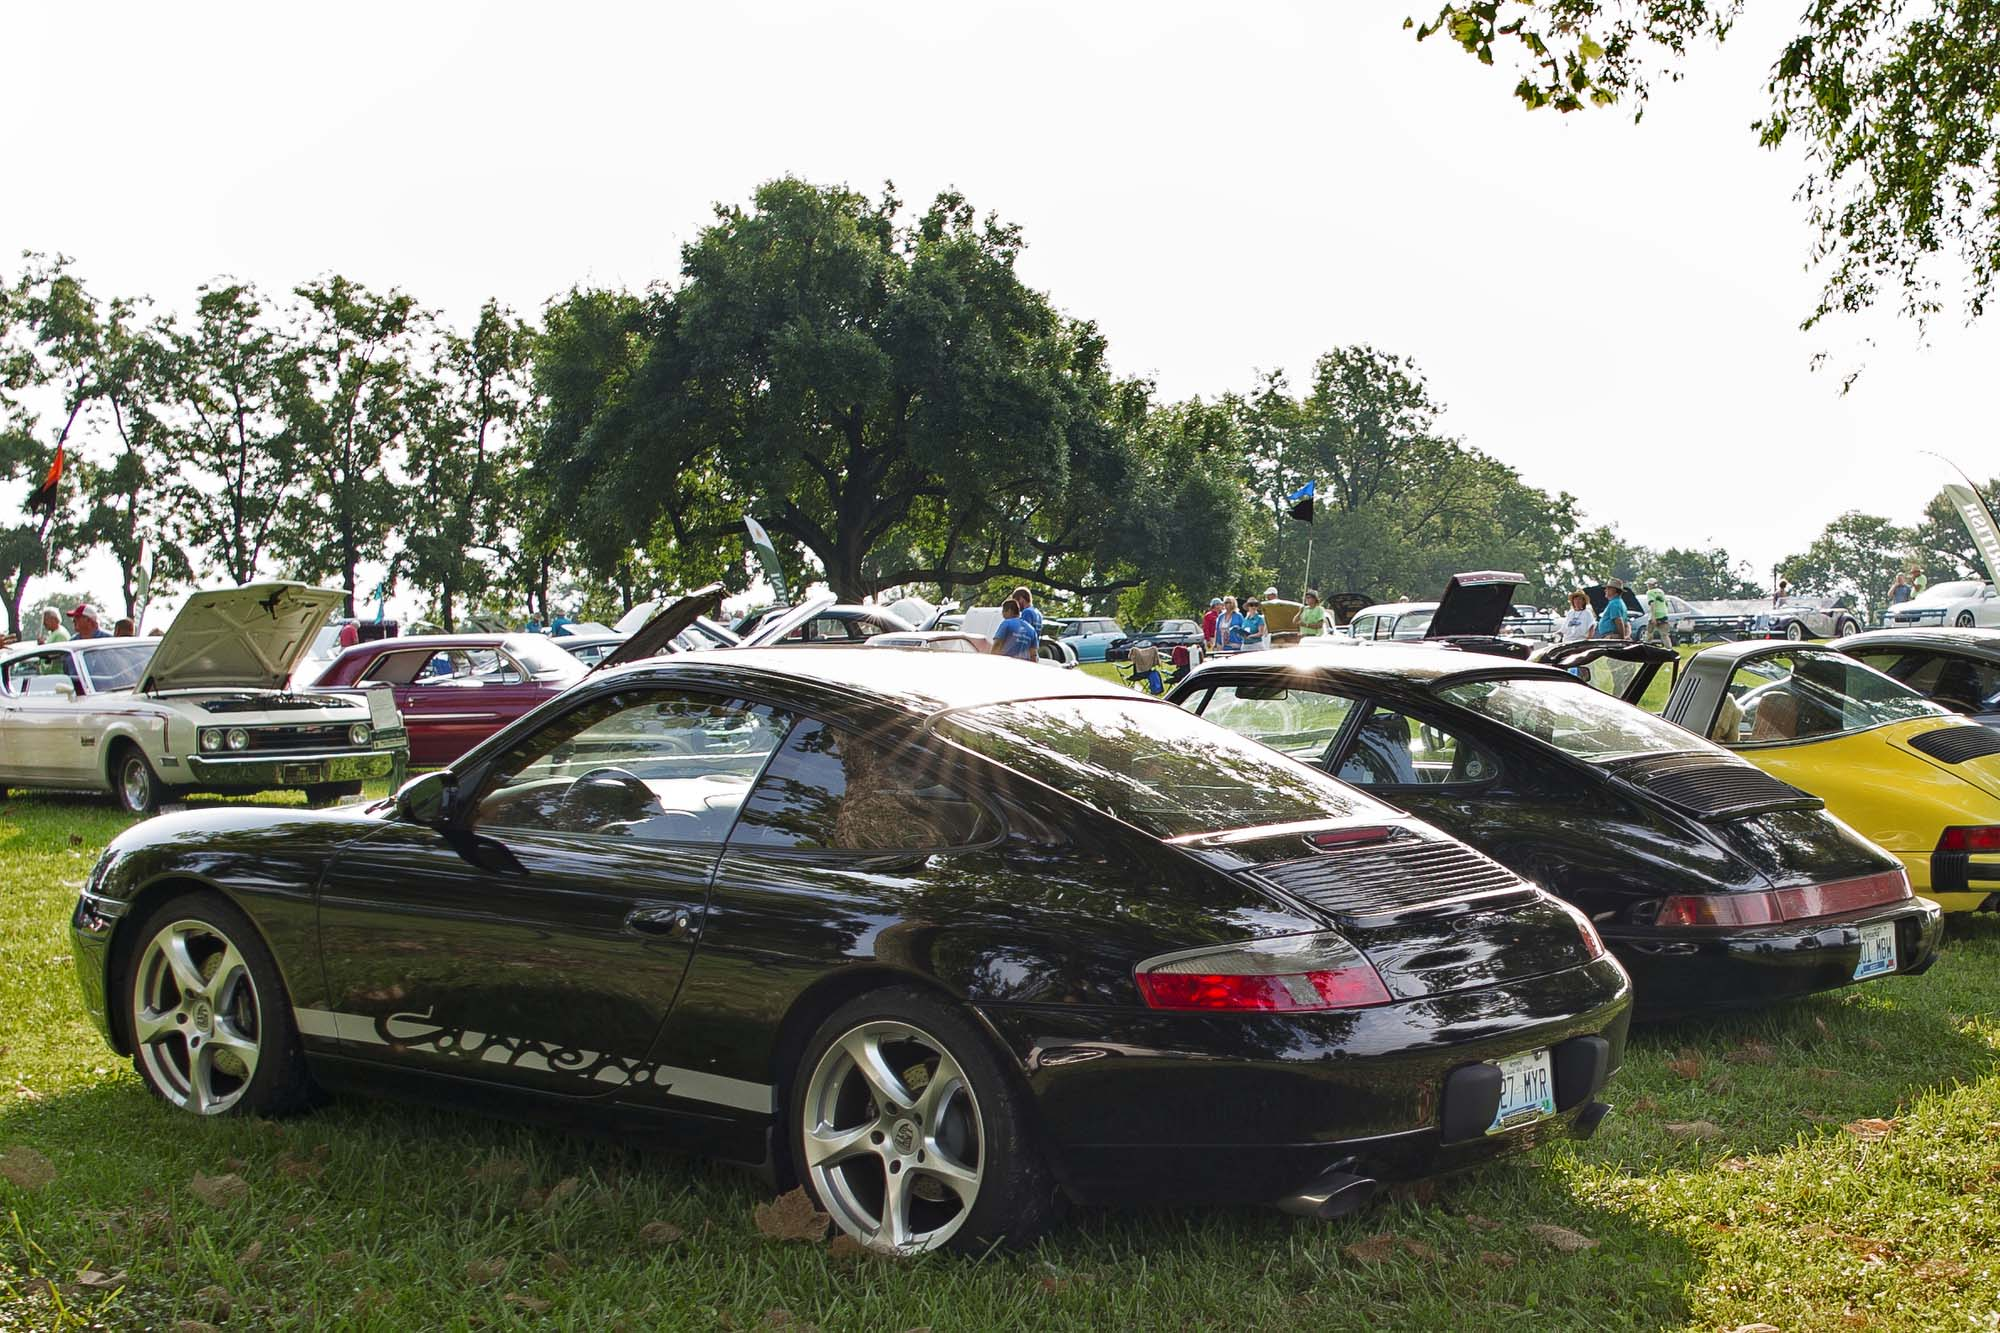 2015 Keeneland Concours d.Elegance.Porsche Club of America (Bluegrass Region) Paddock. - Photo by Joseph Rey Au